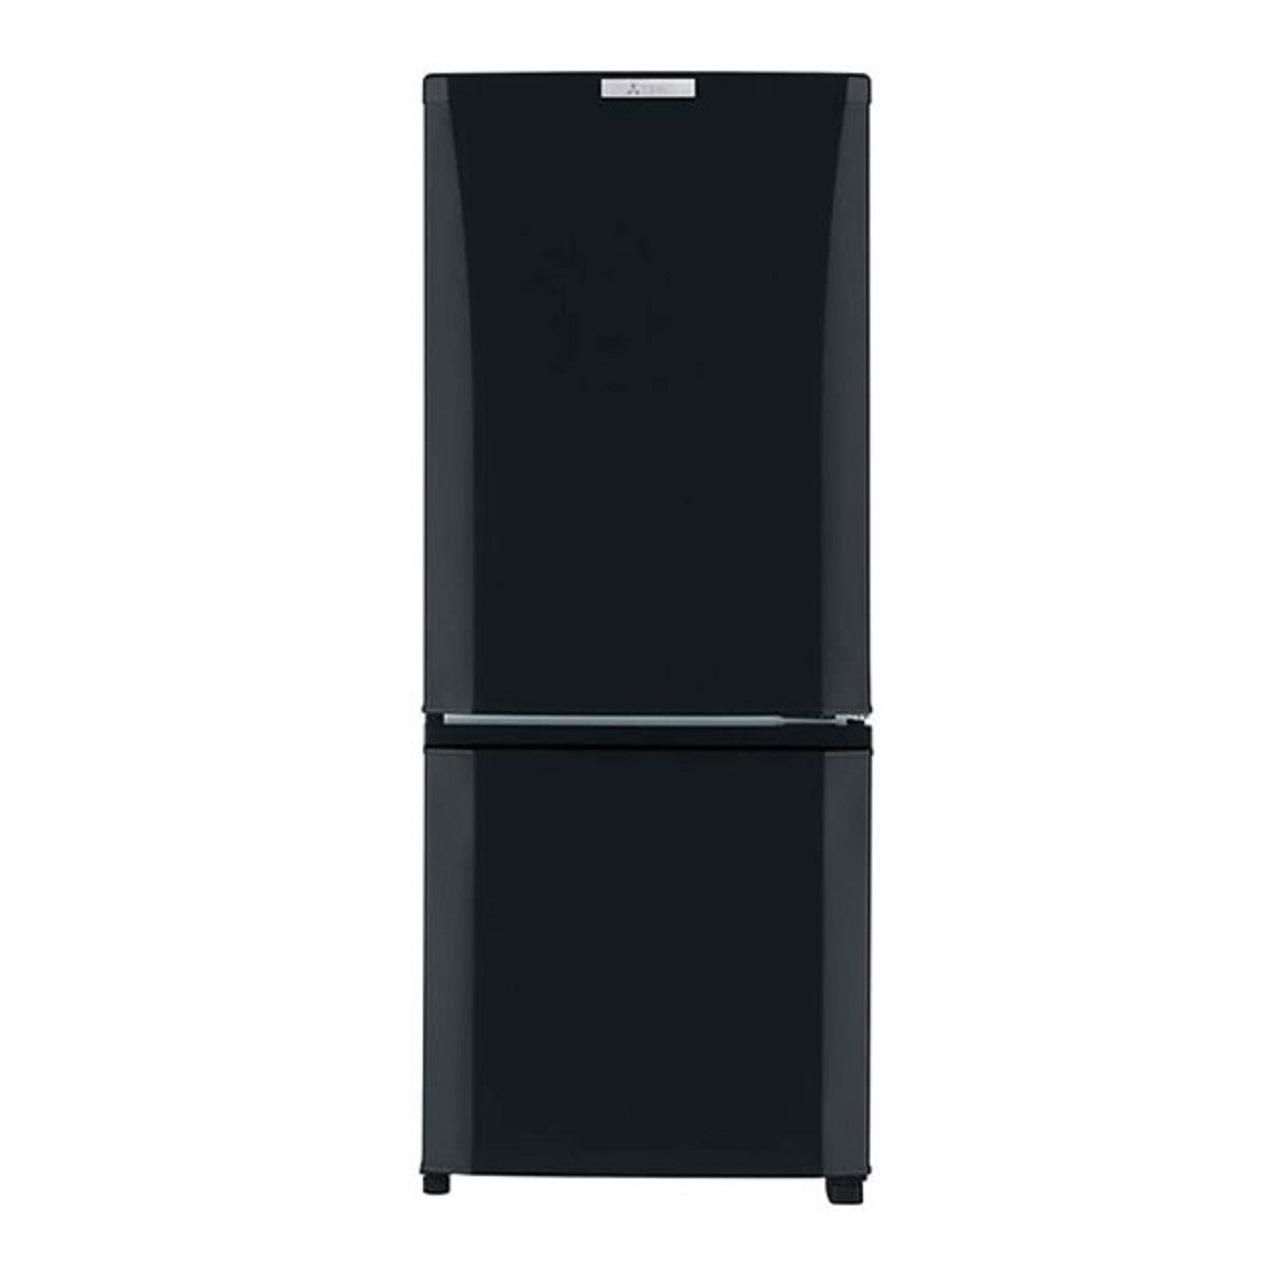 三菱MR-P15E冷蔵庫